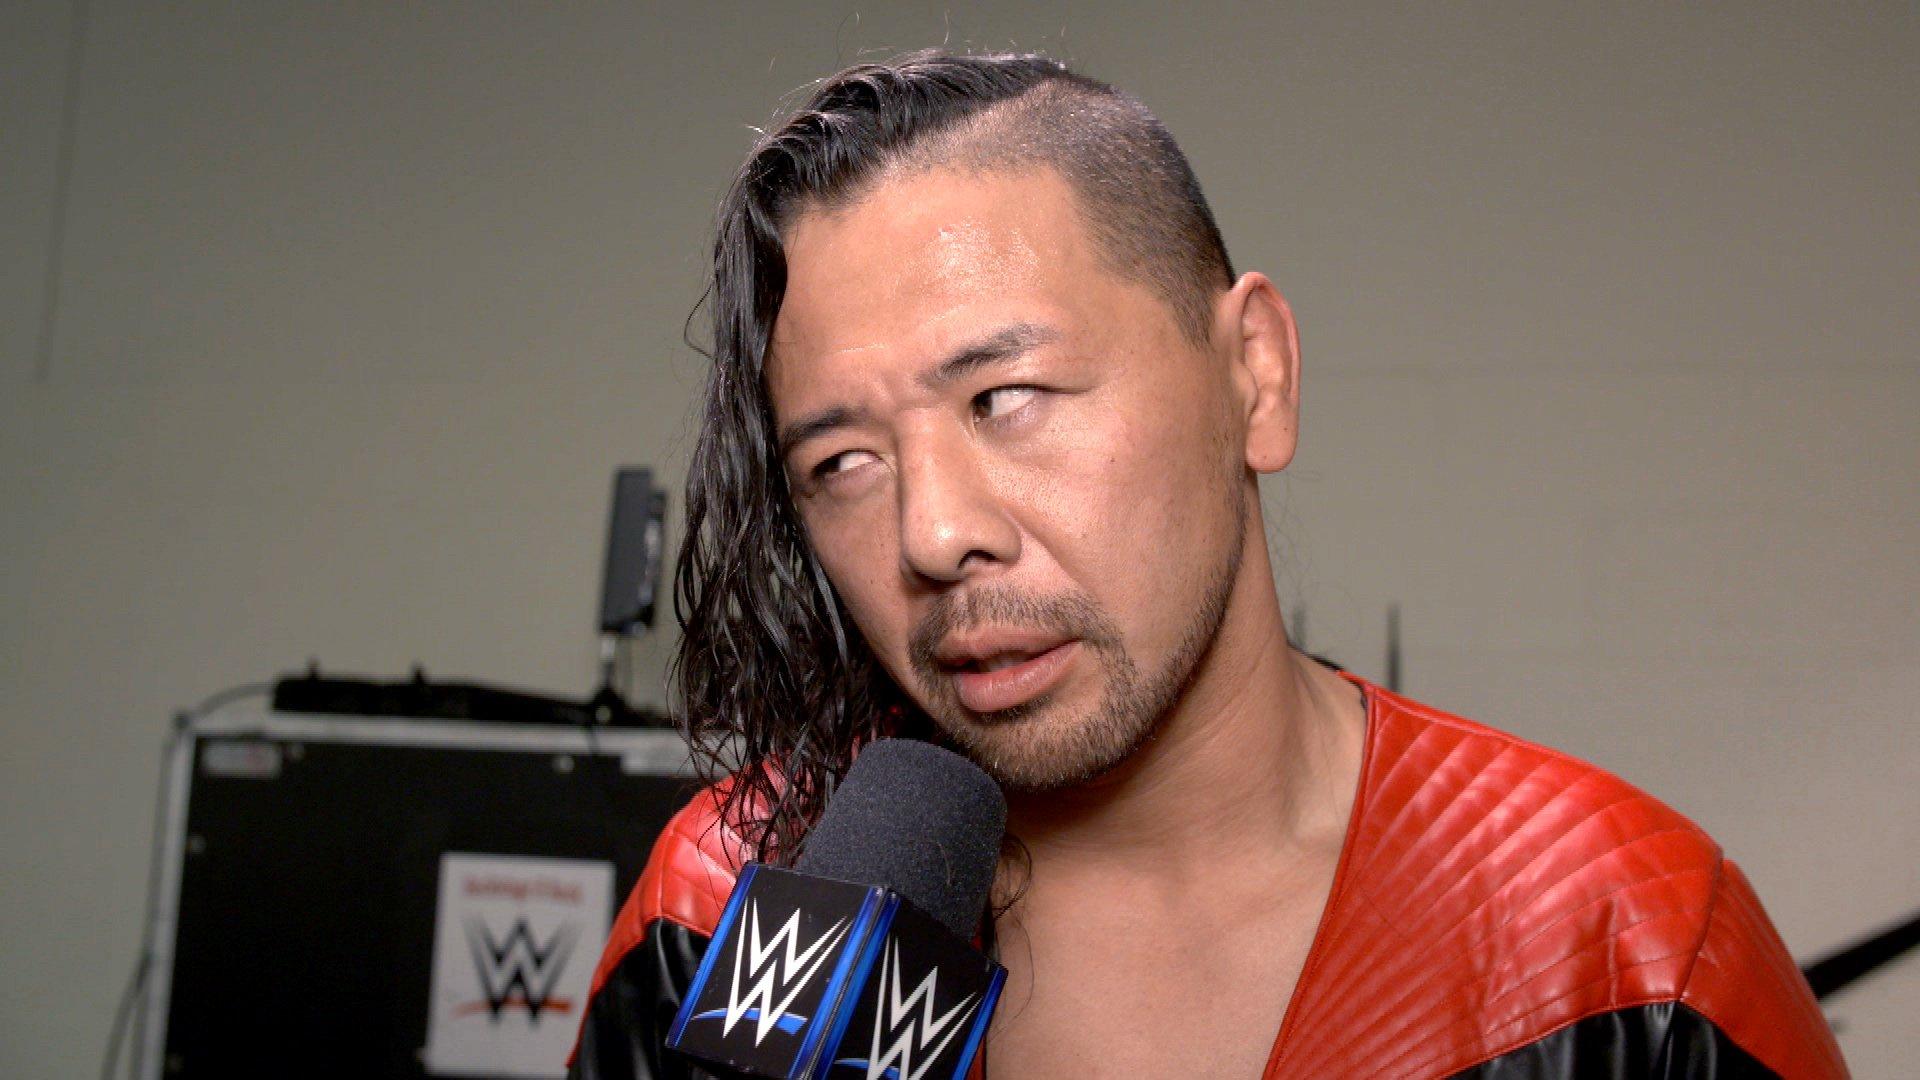 Shinsuke Nakamura doesn't celebrate Rusev Day: WWE.com Exclusives, Jan. 1, 2019